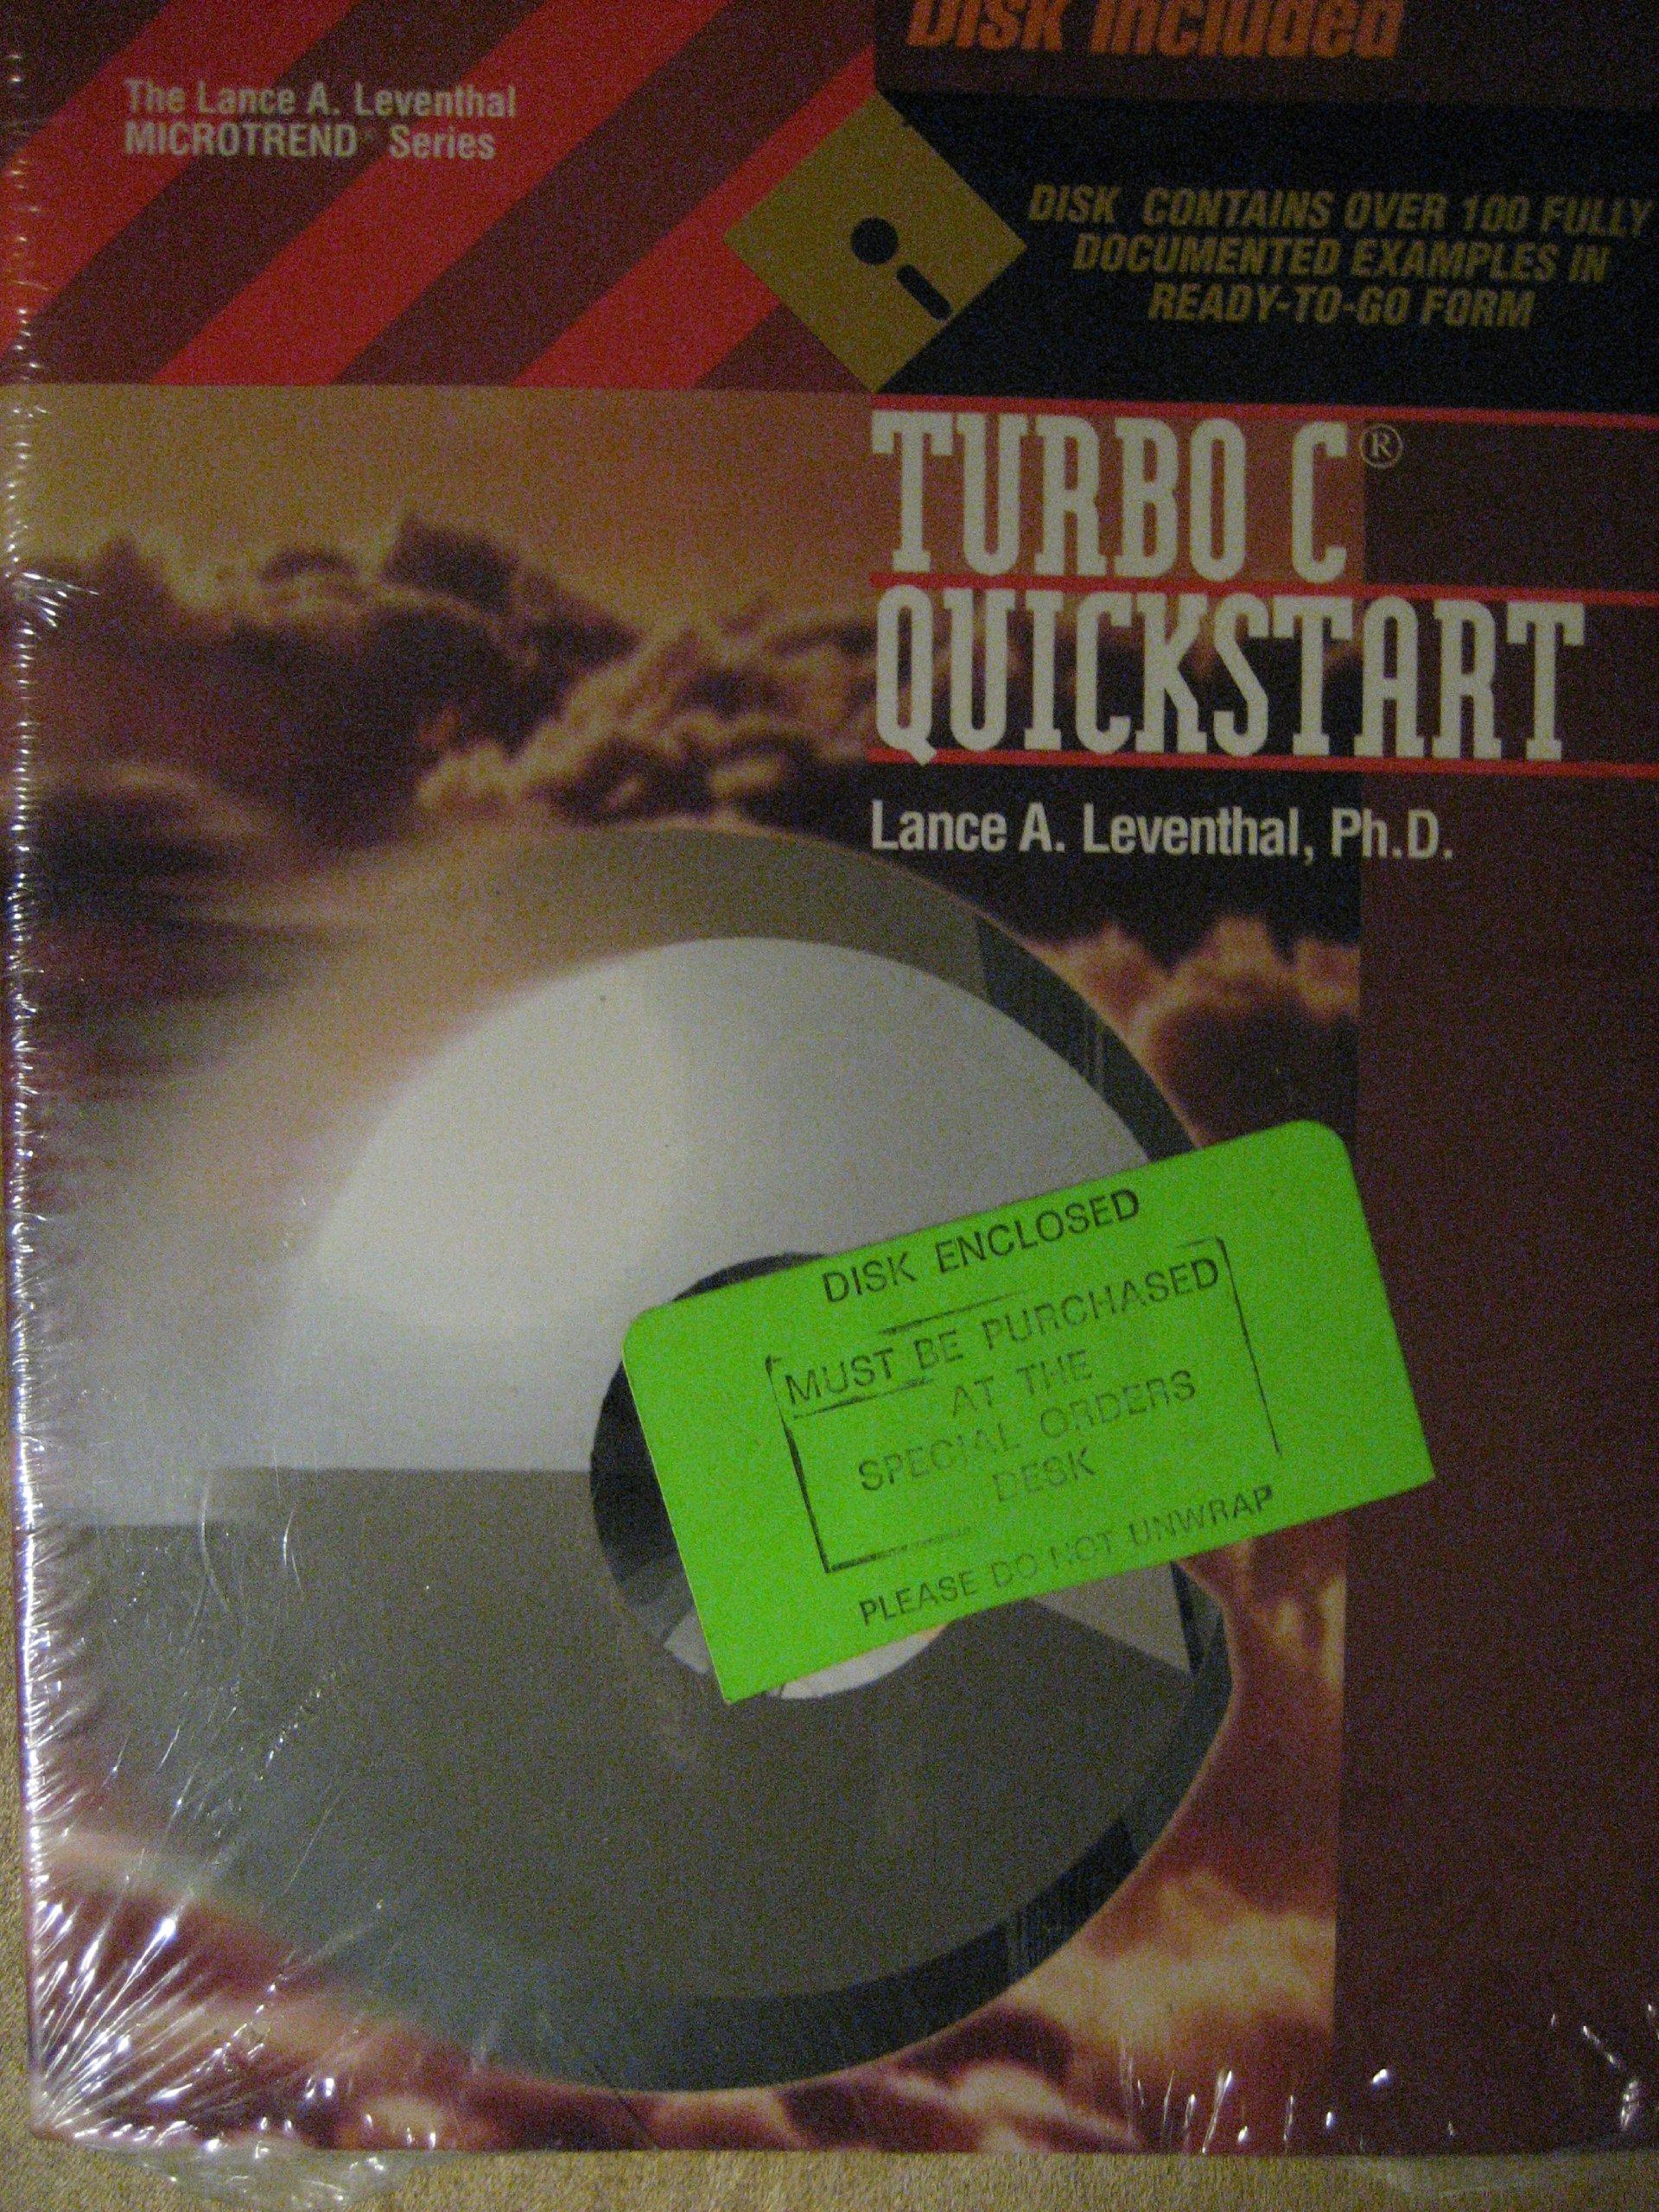 Turbo C. QuickStart Lance A. Leventhal Microtrend Series: Amazon.es: Lance A. Leventhal: Libros en idiomas extranjeros